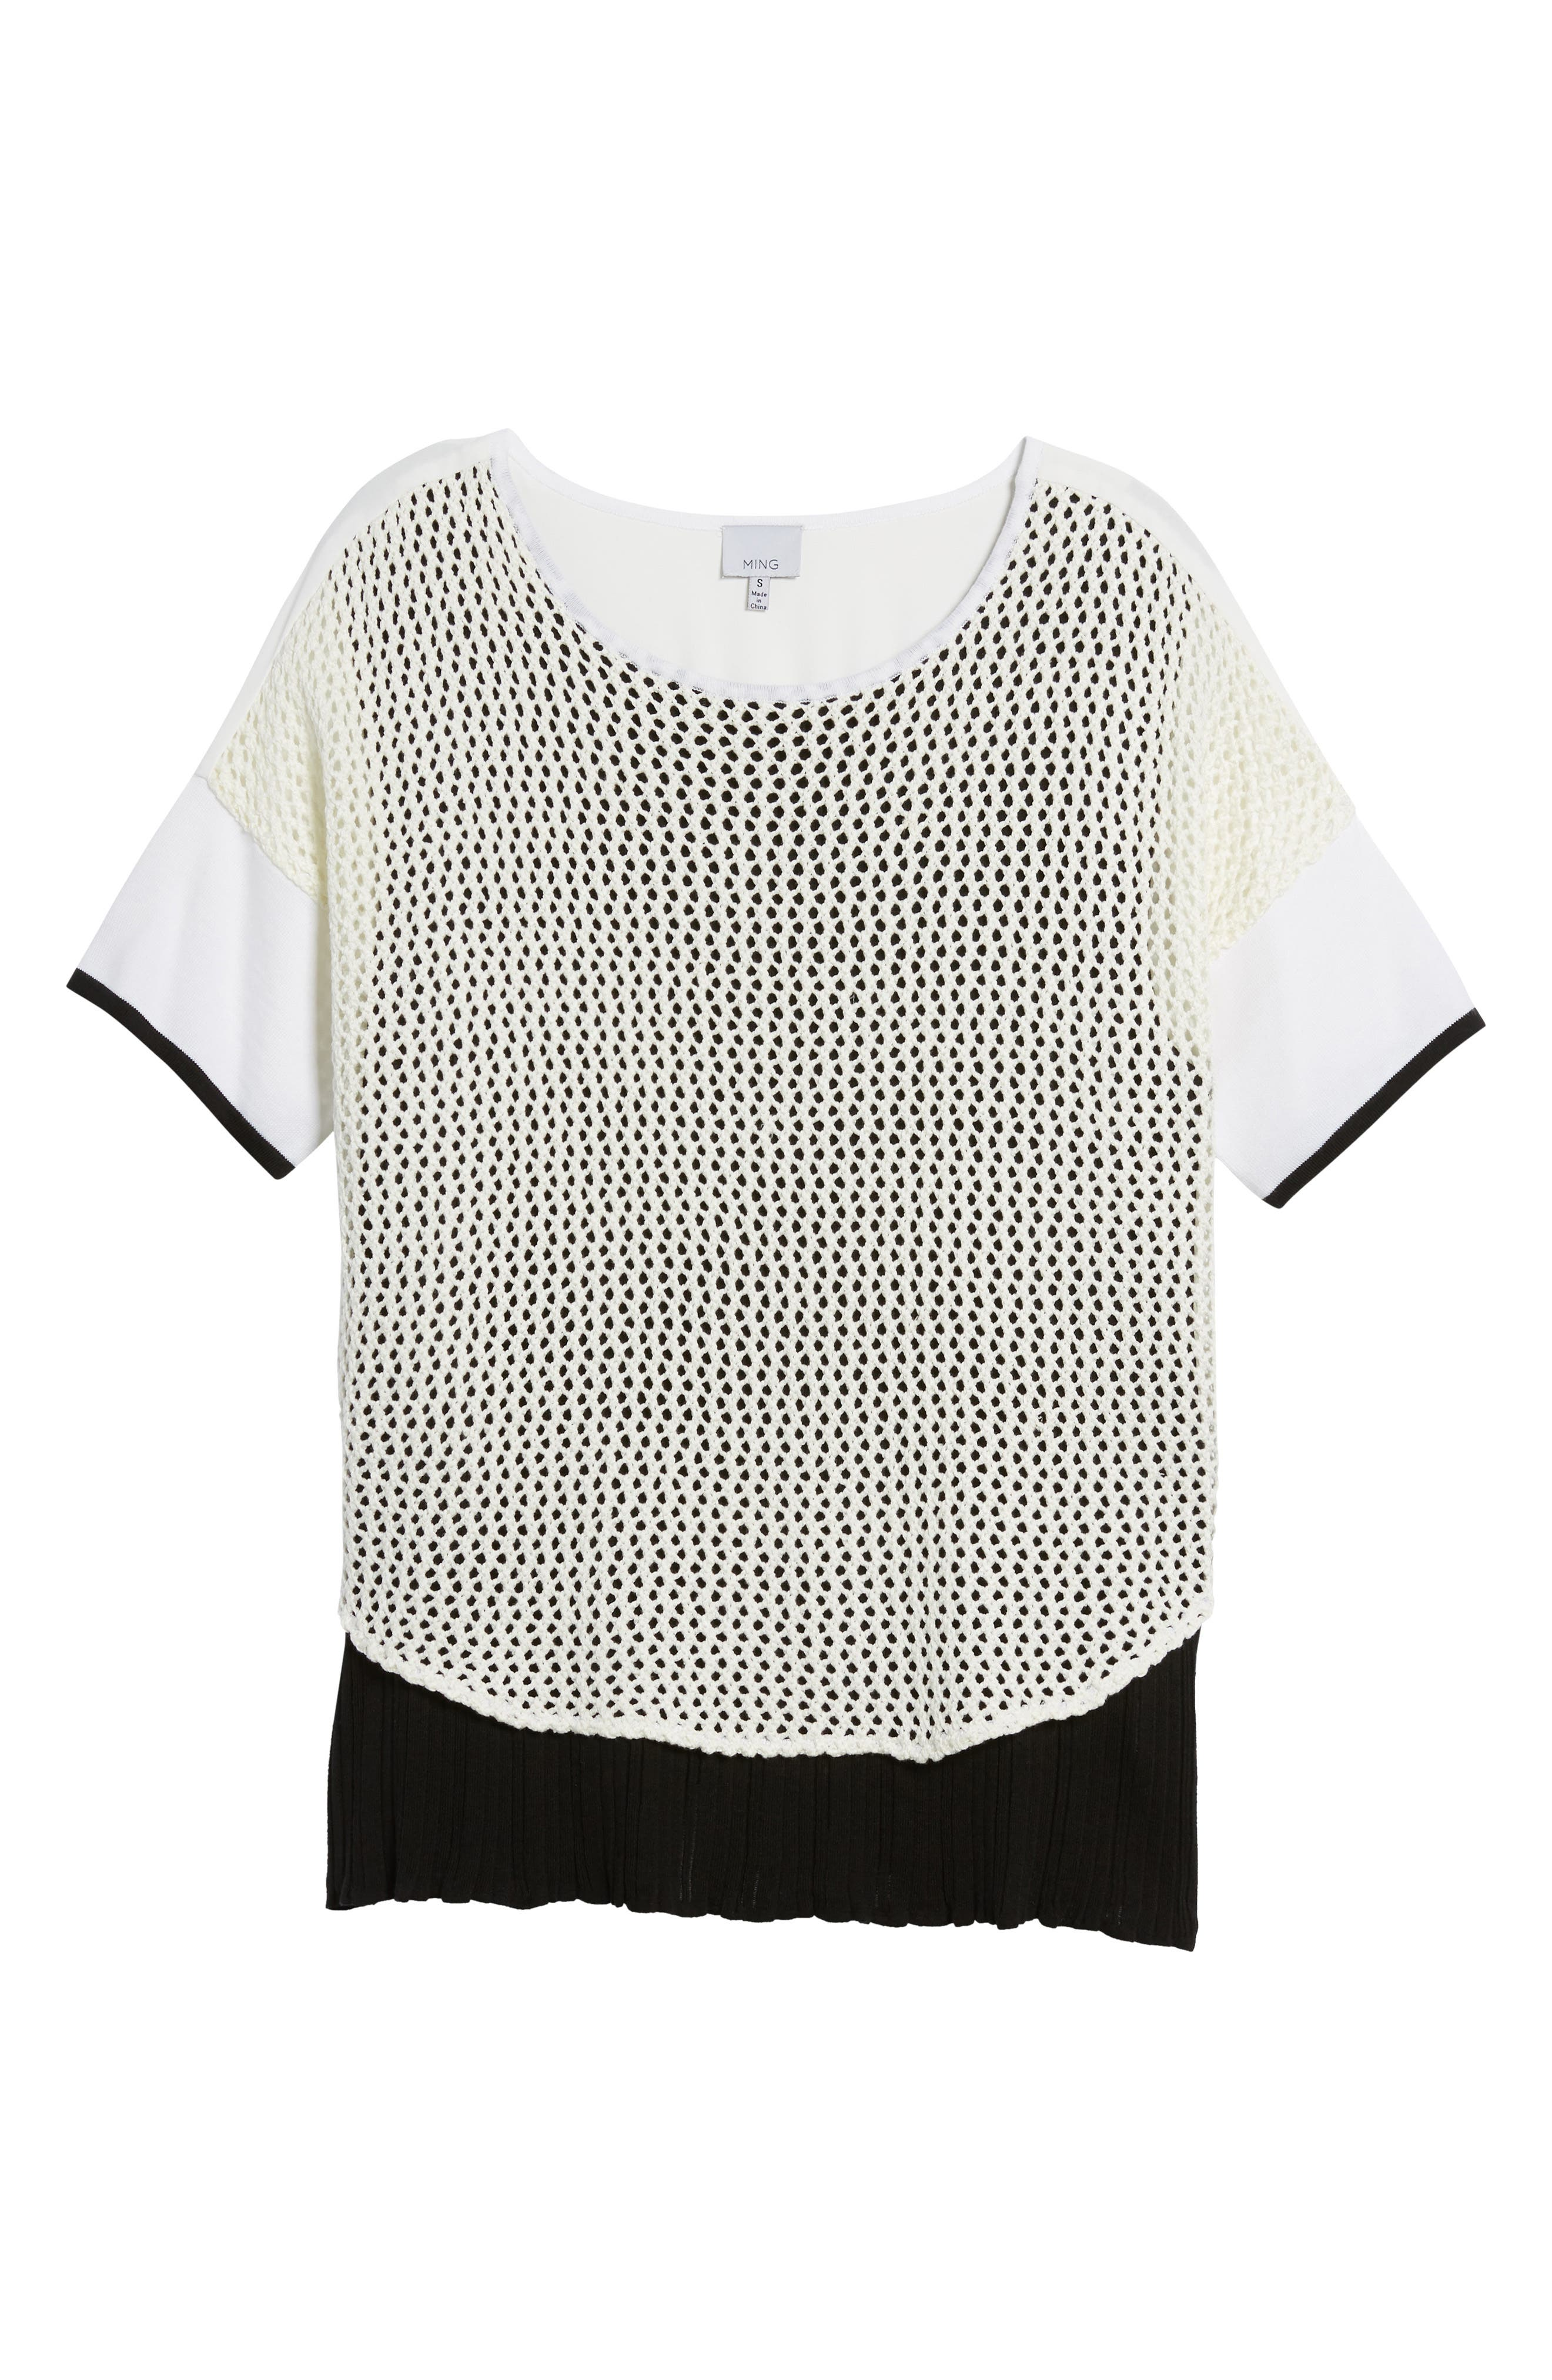 Mixed Media Short Sleeve Tunic Top,                             Alternate thumbnail 6, color,                             White/ Black